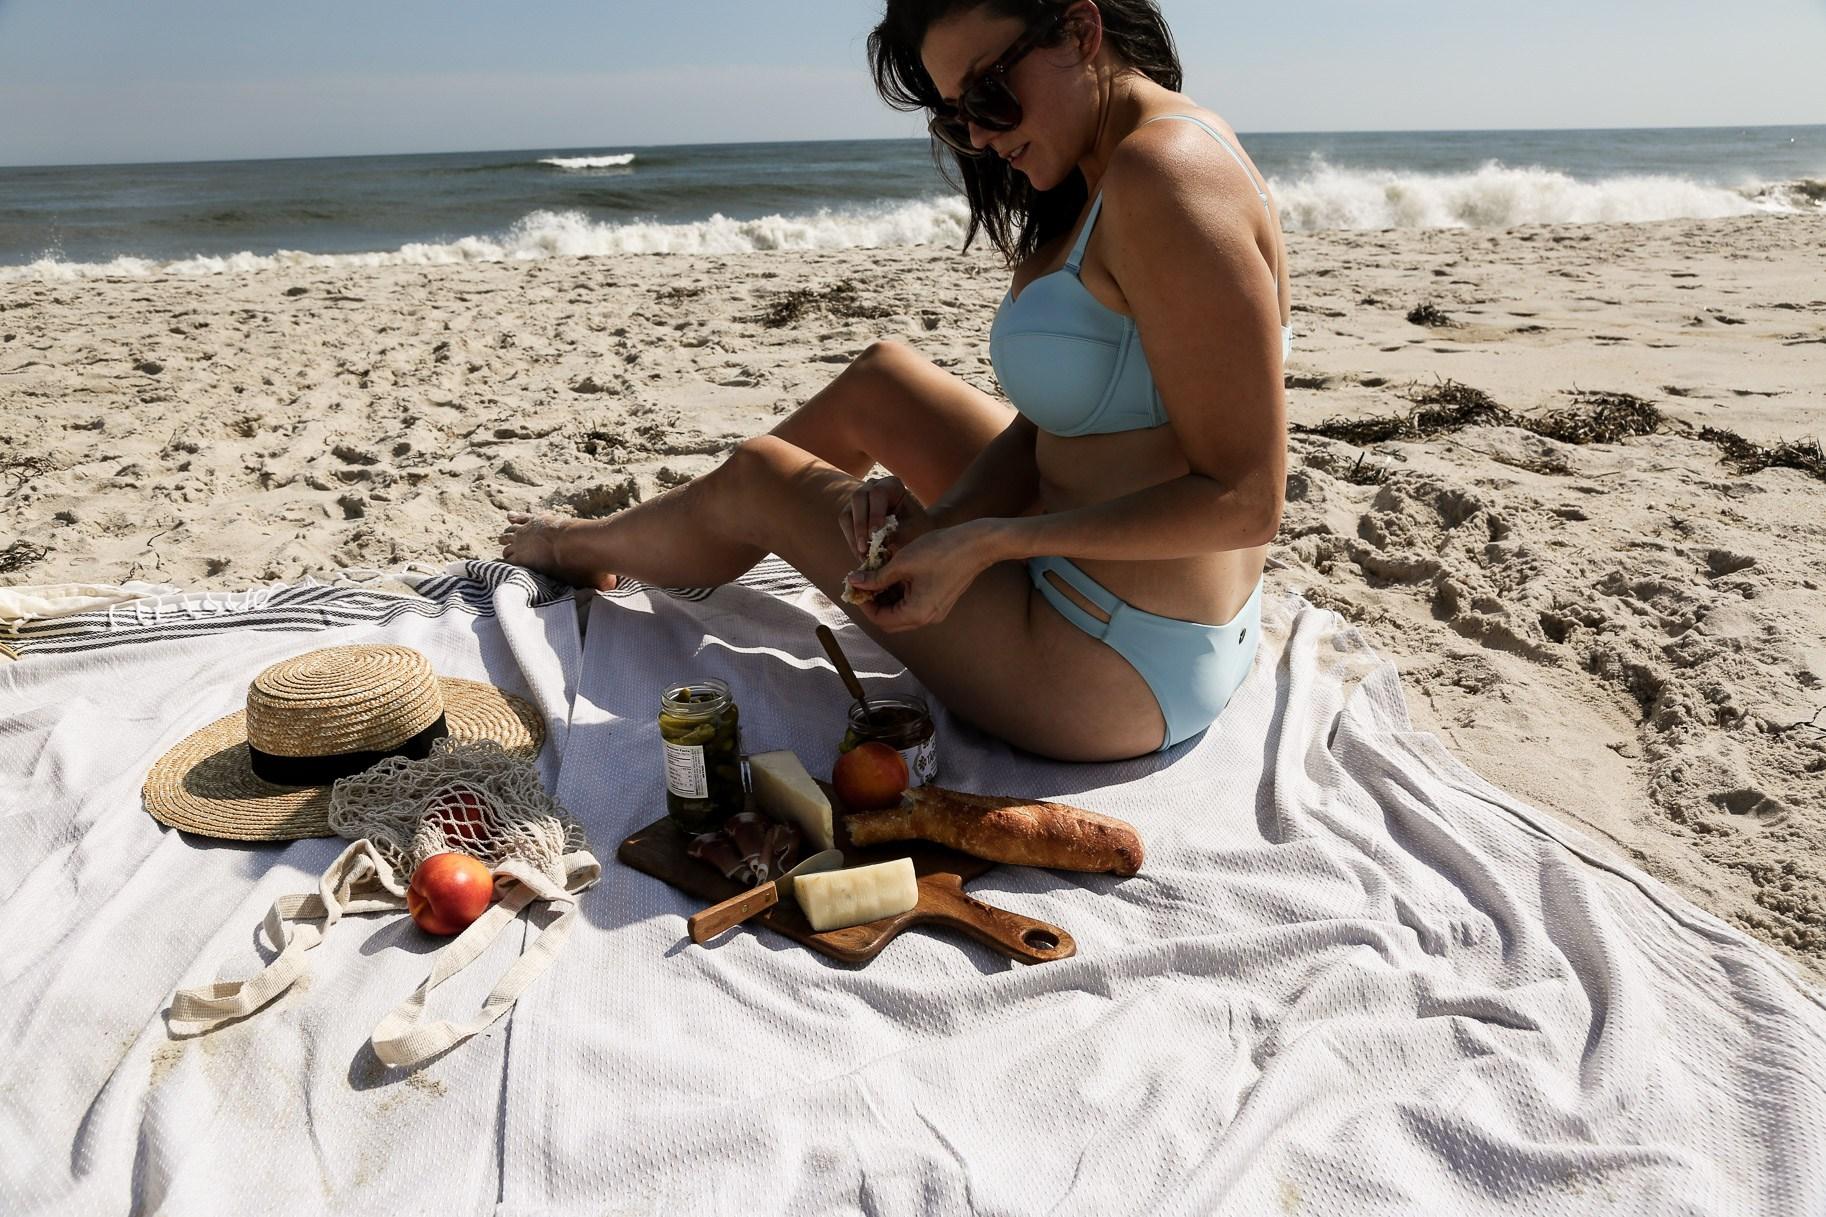 picnic-at-the-beach.jpg